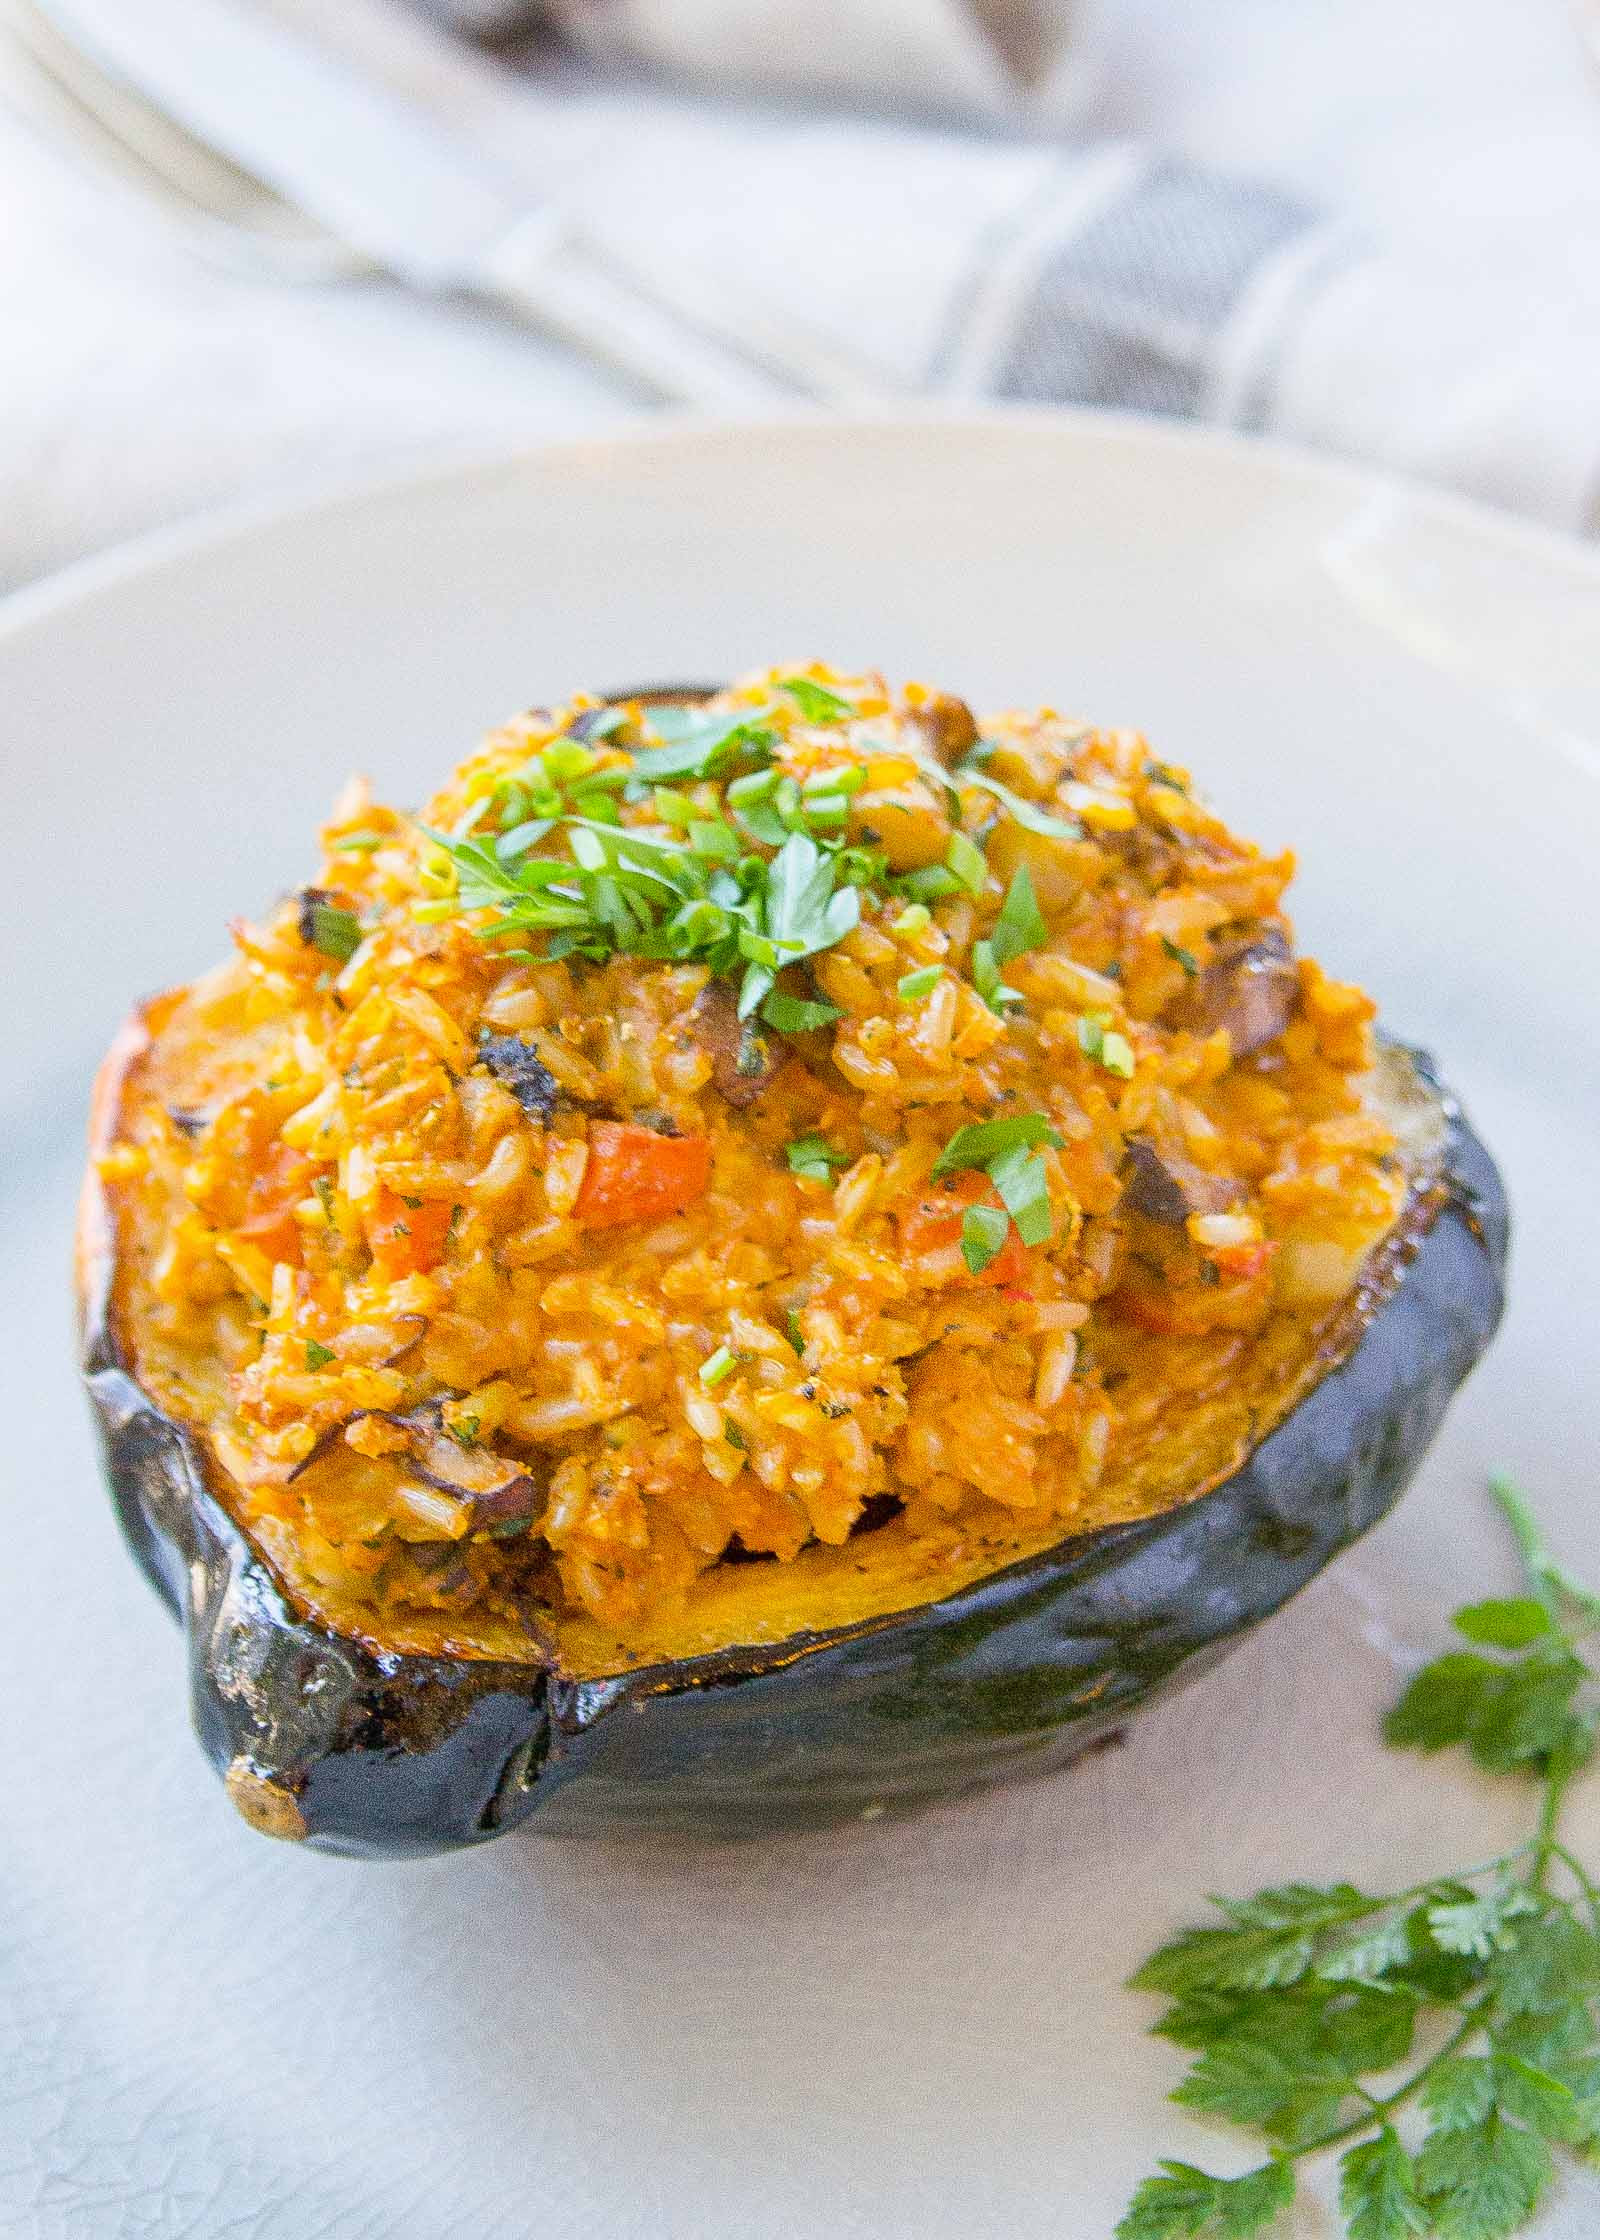 Vegan Squash Recipes  Vegan Stuffed Squash with Brown Rice and Mushrooms Recipe